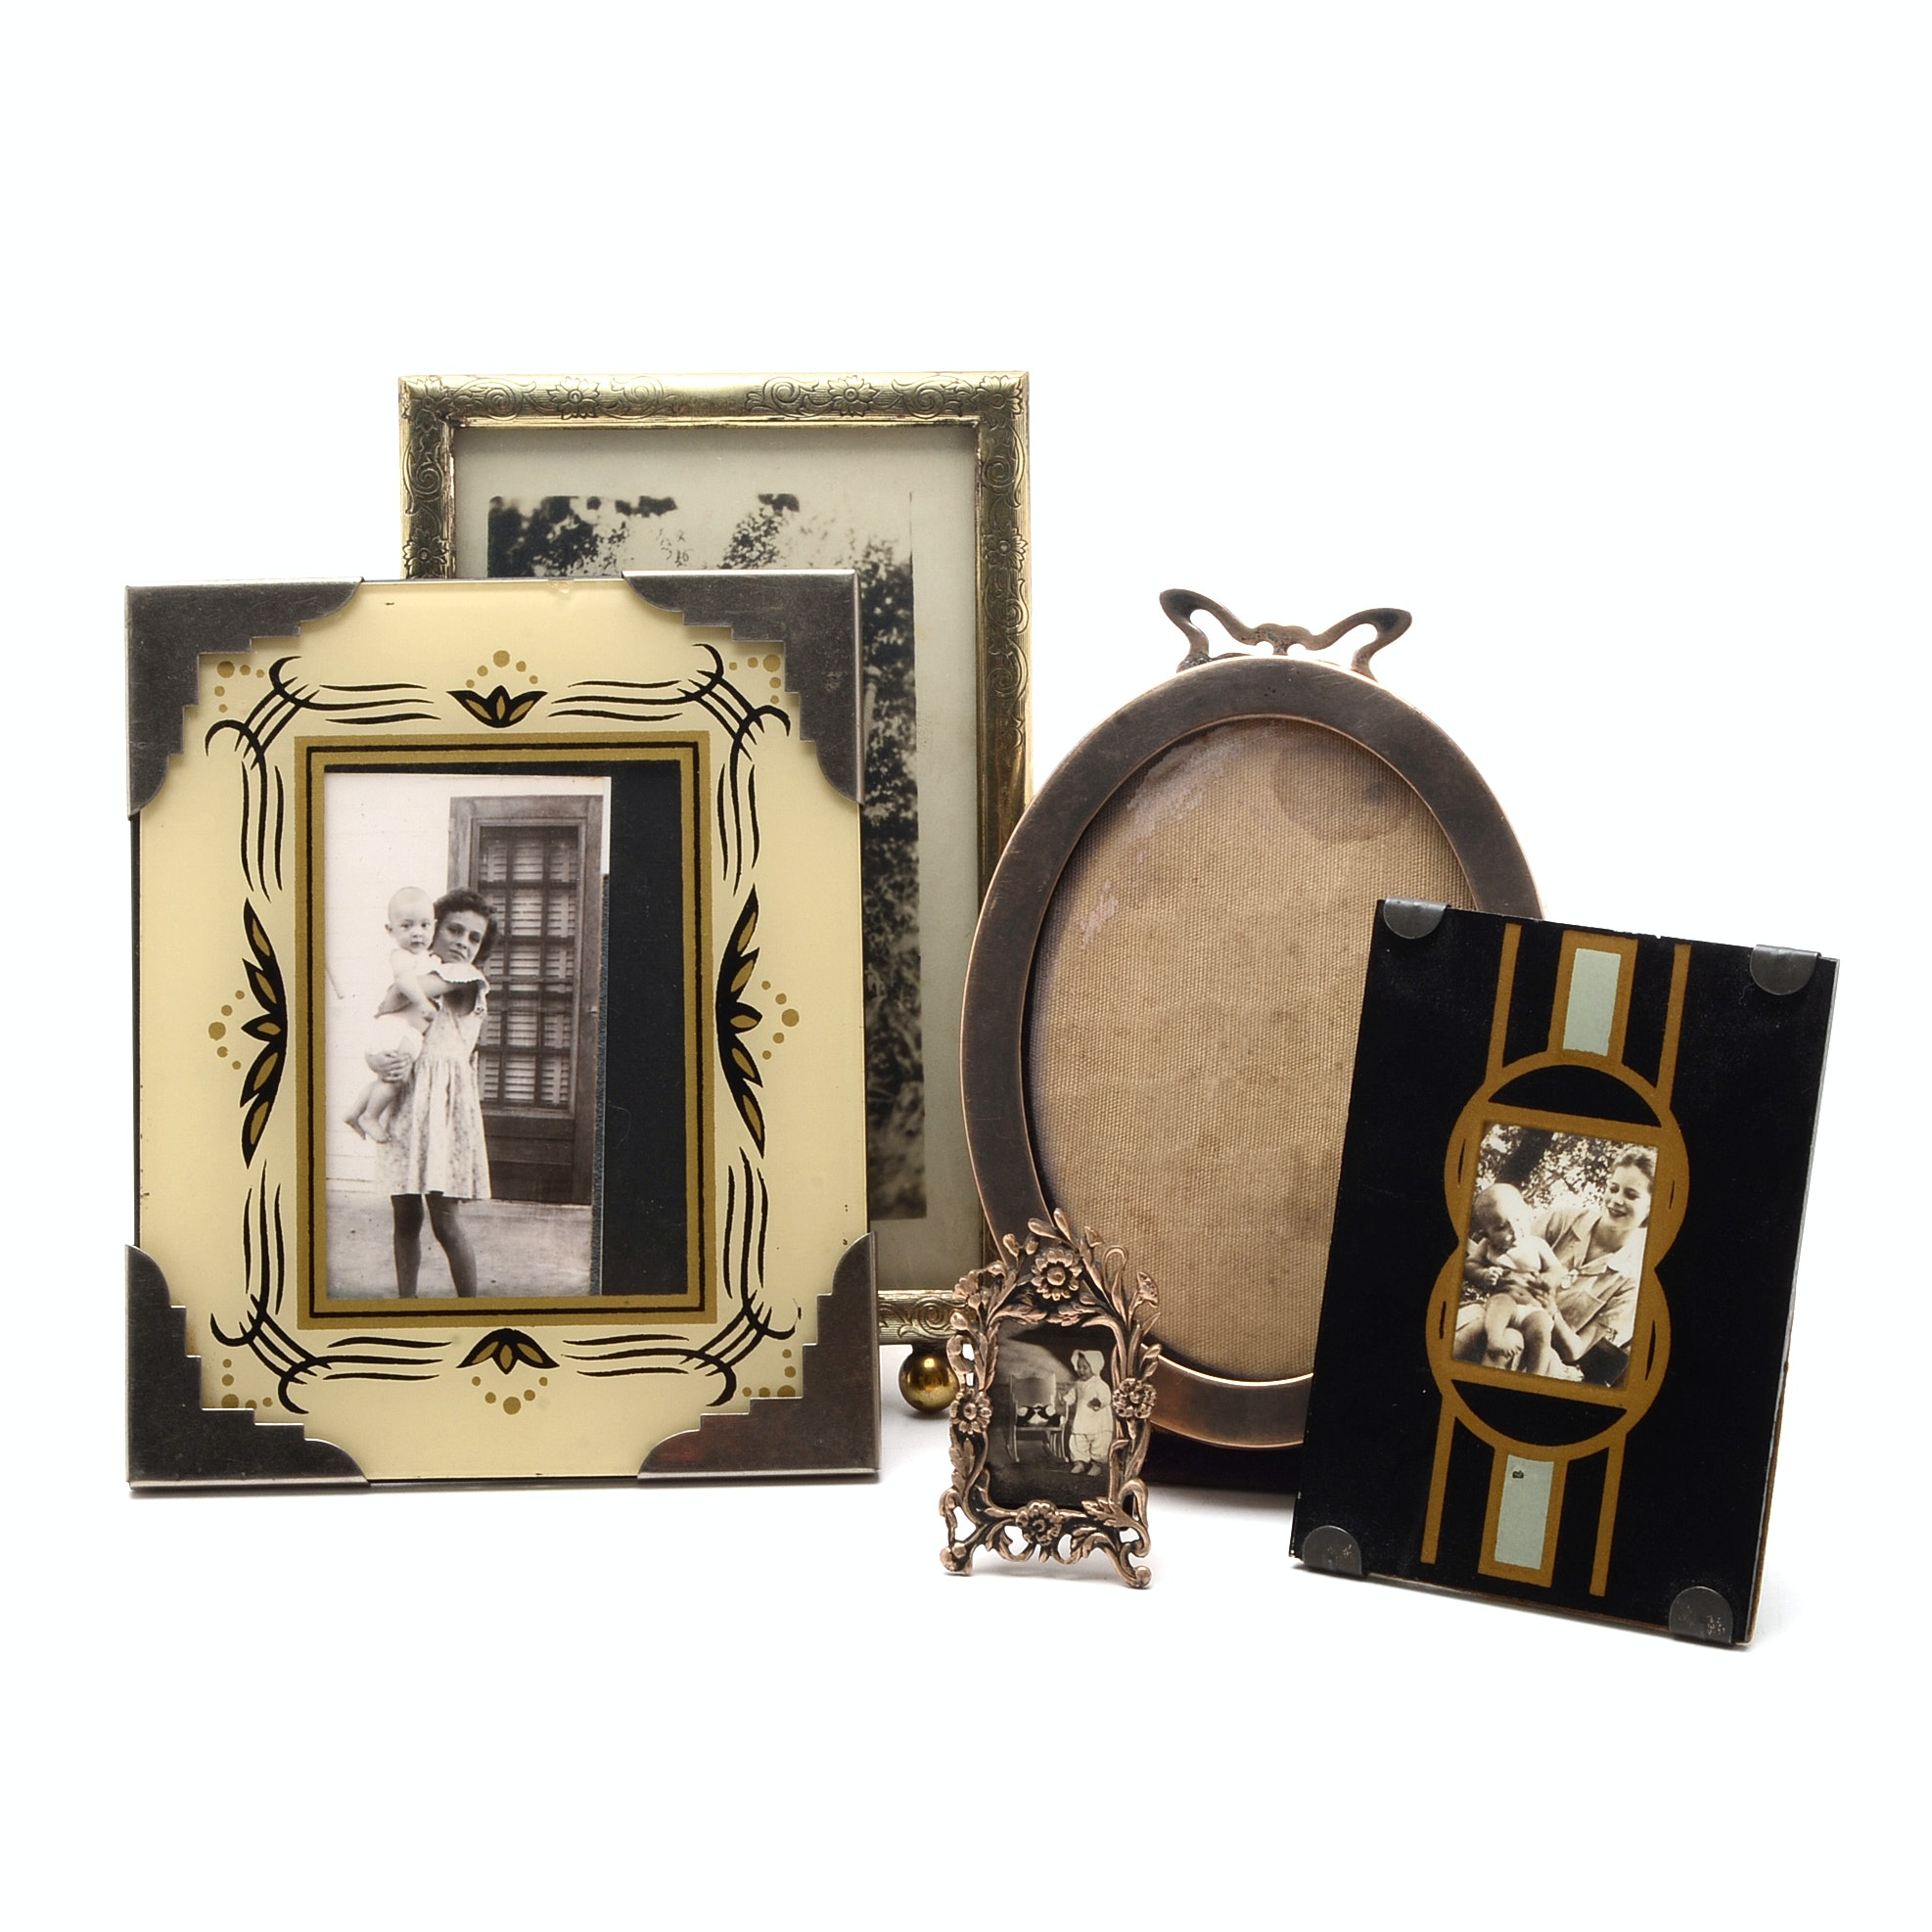 Unger Brothers Sterling Picture Frame and Other Vintage Frames